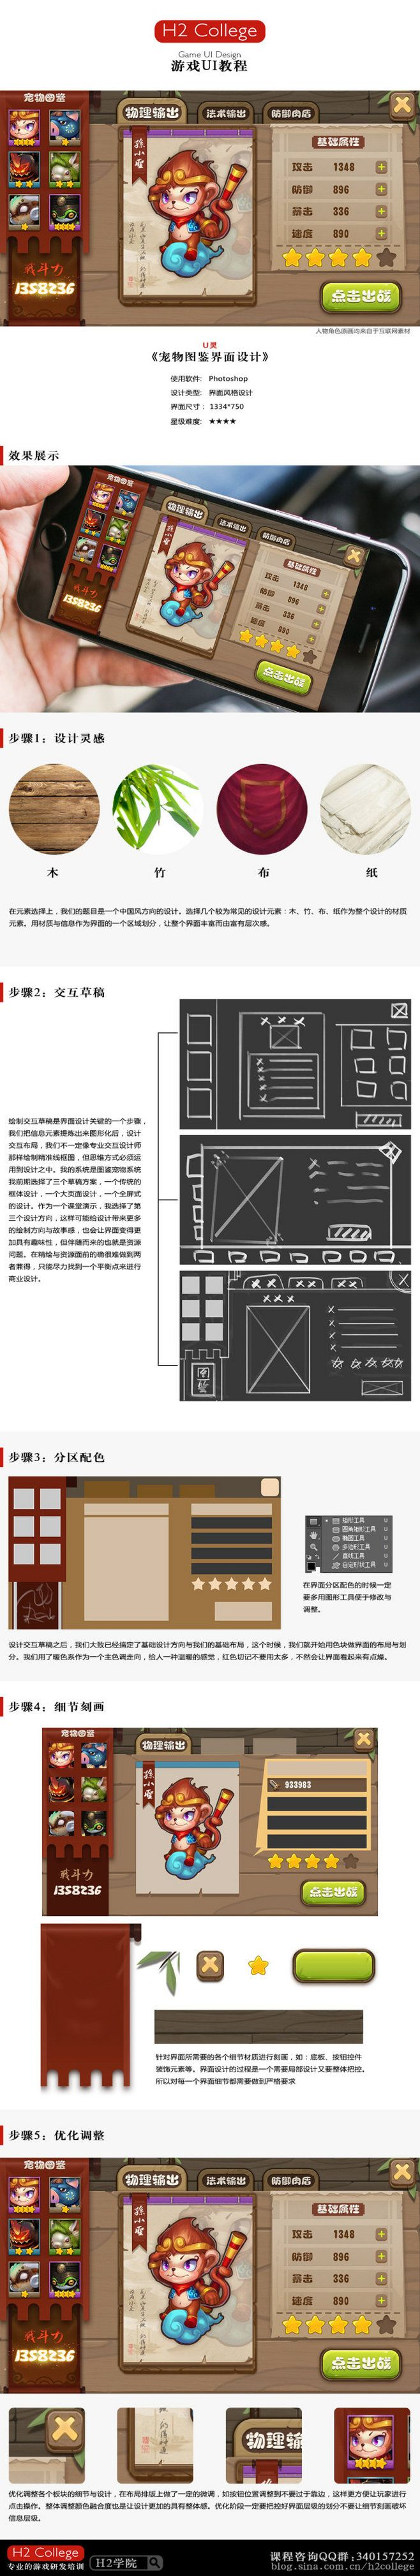 【H2学院】游戏UI教程(定期更新) H...